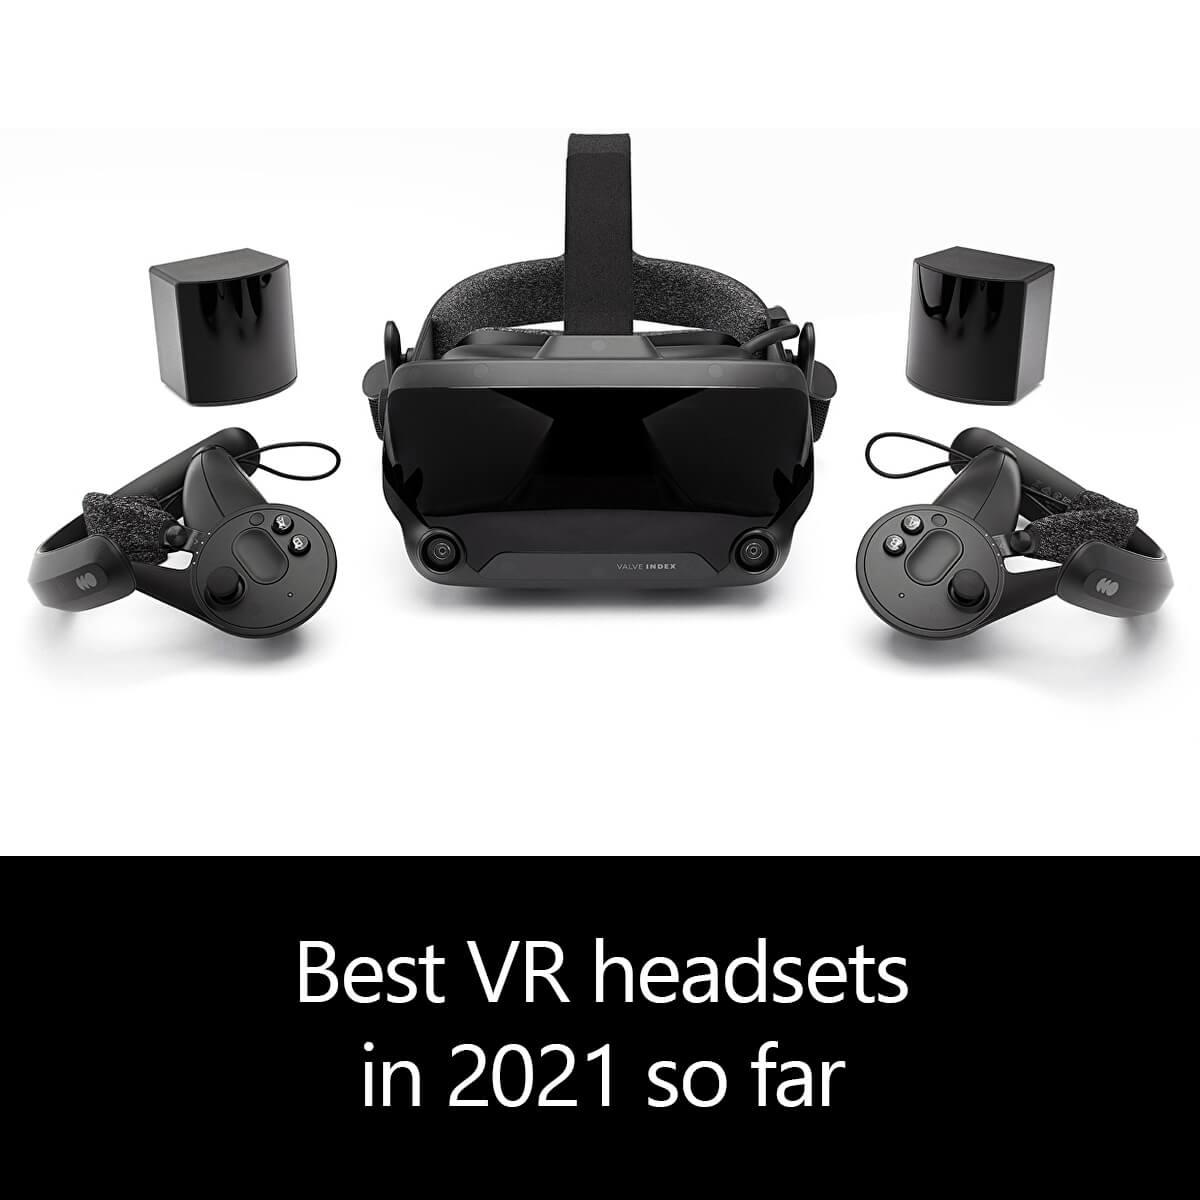 Best VR headsets in 2021 so far